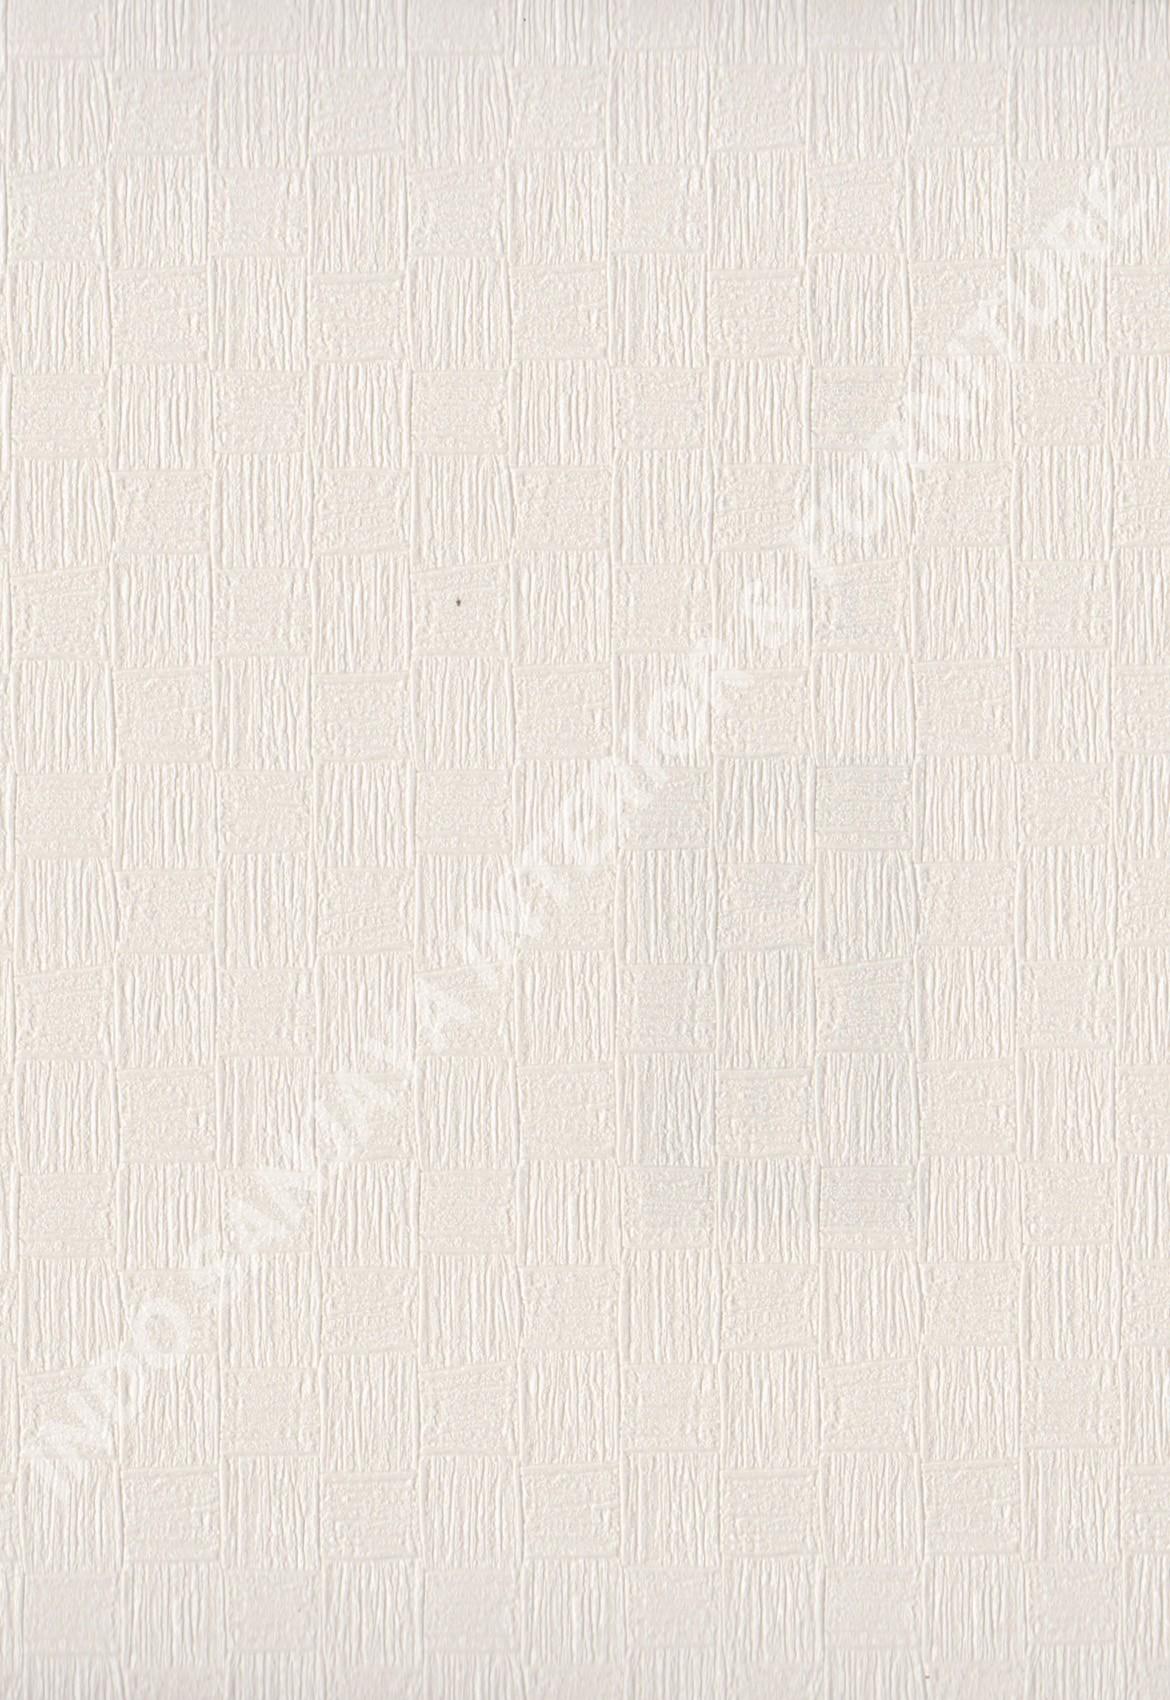 wallpaper   Wallpaper Minimalis Polos E108042:E108042 corak  warna